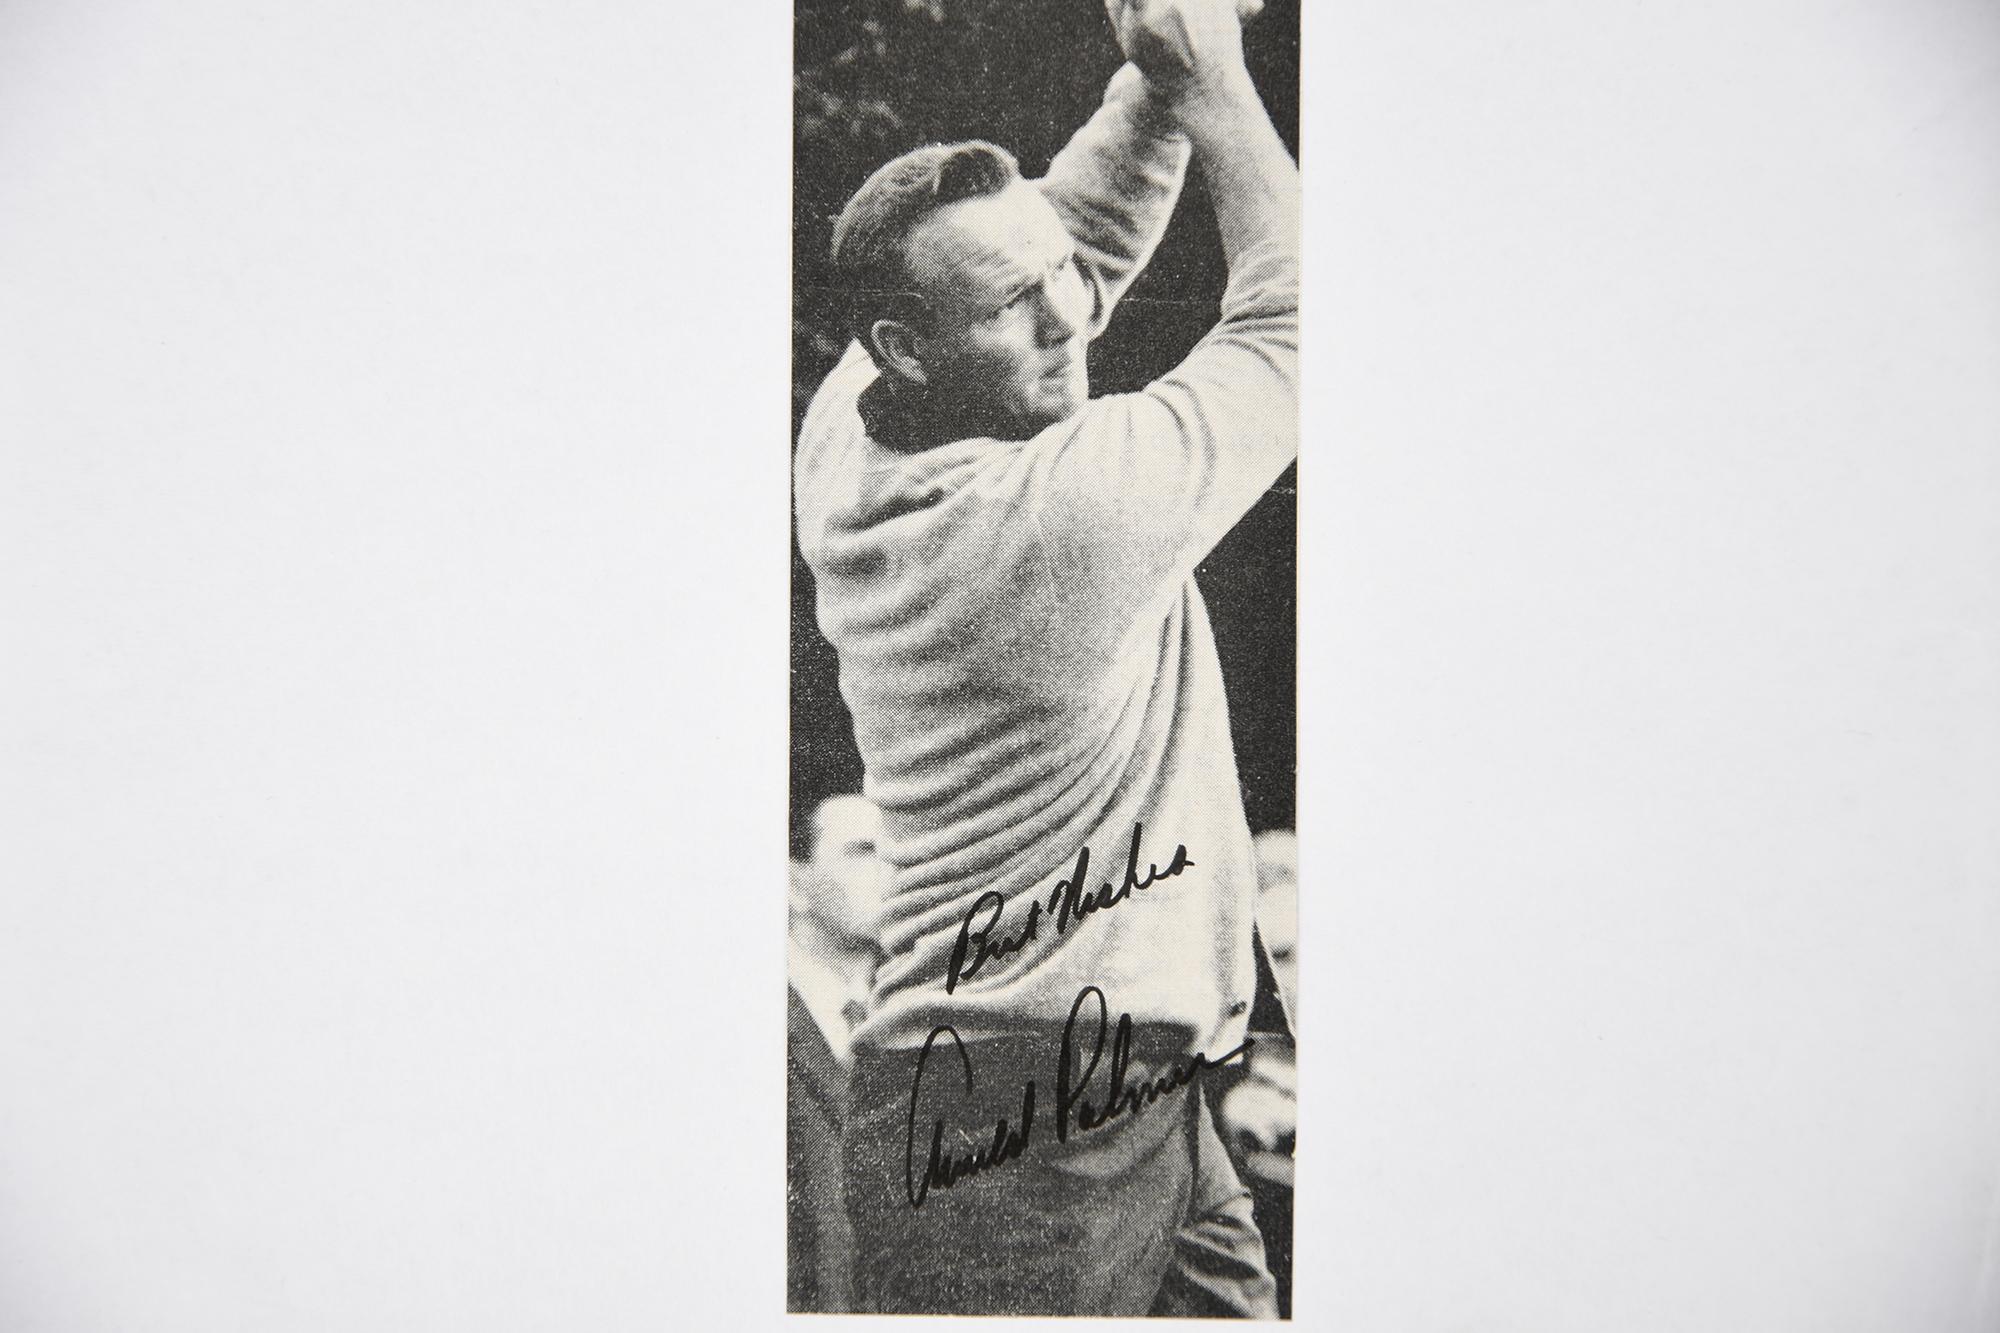 JACK NICKLAUS, GARY PLAYER & ARNOLD PALMER Original signatures. - Image 4 of 4